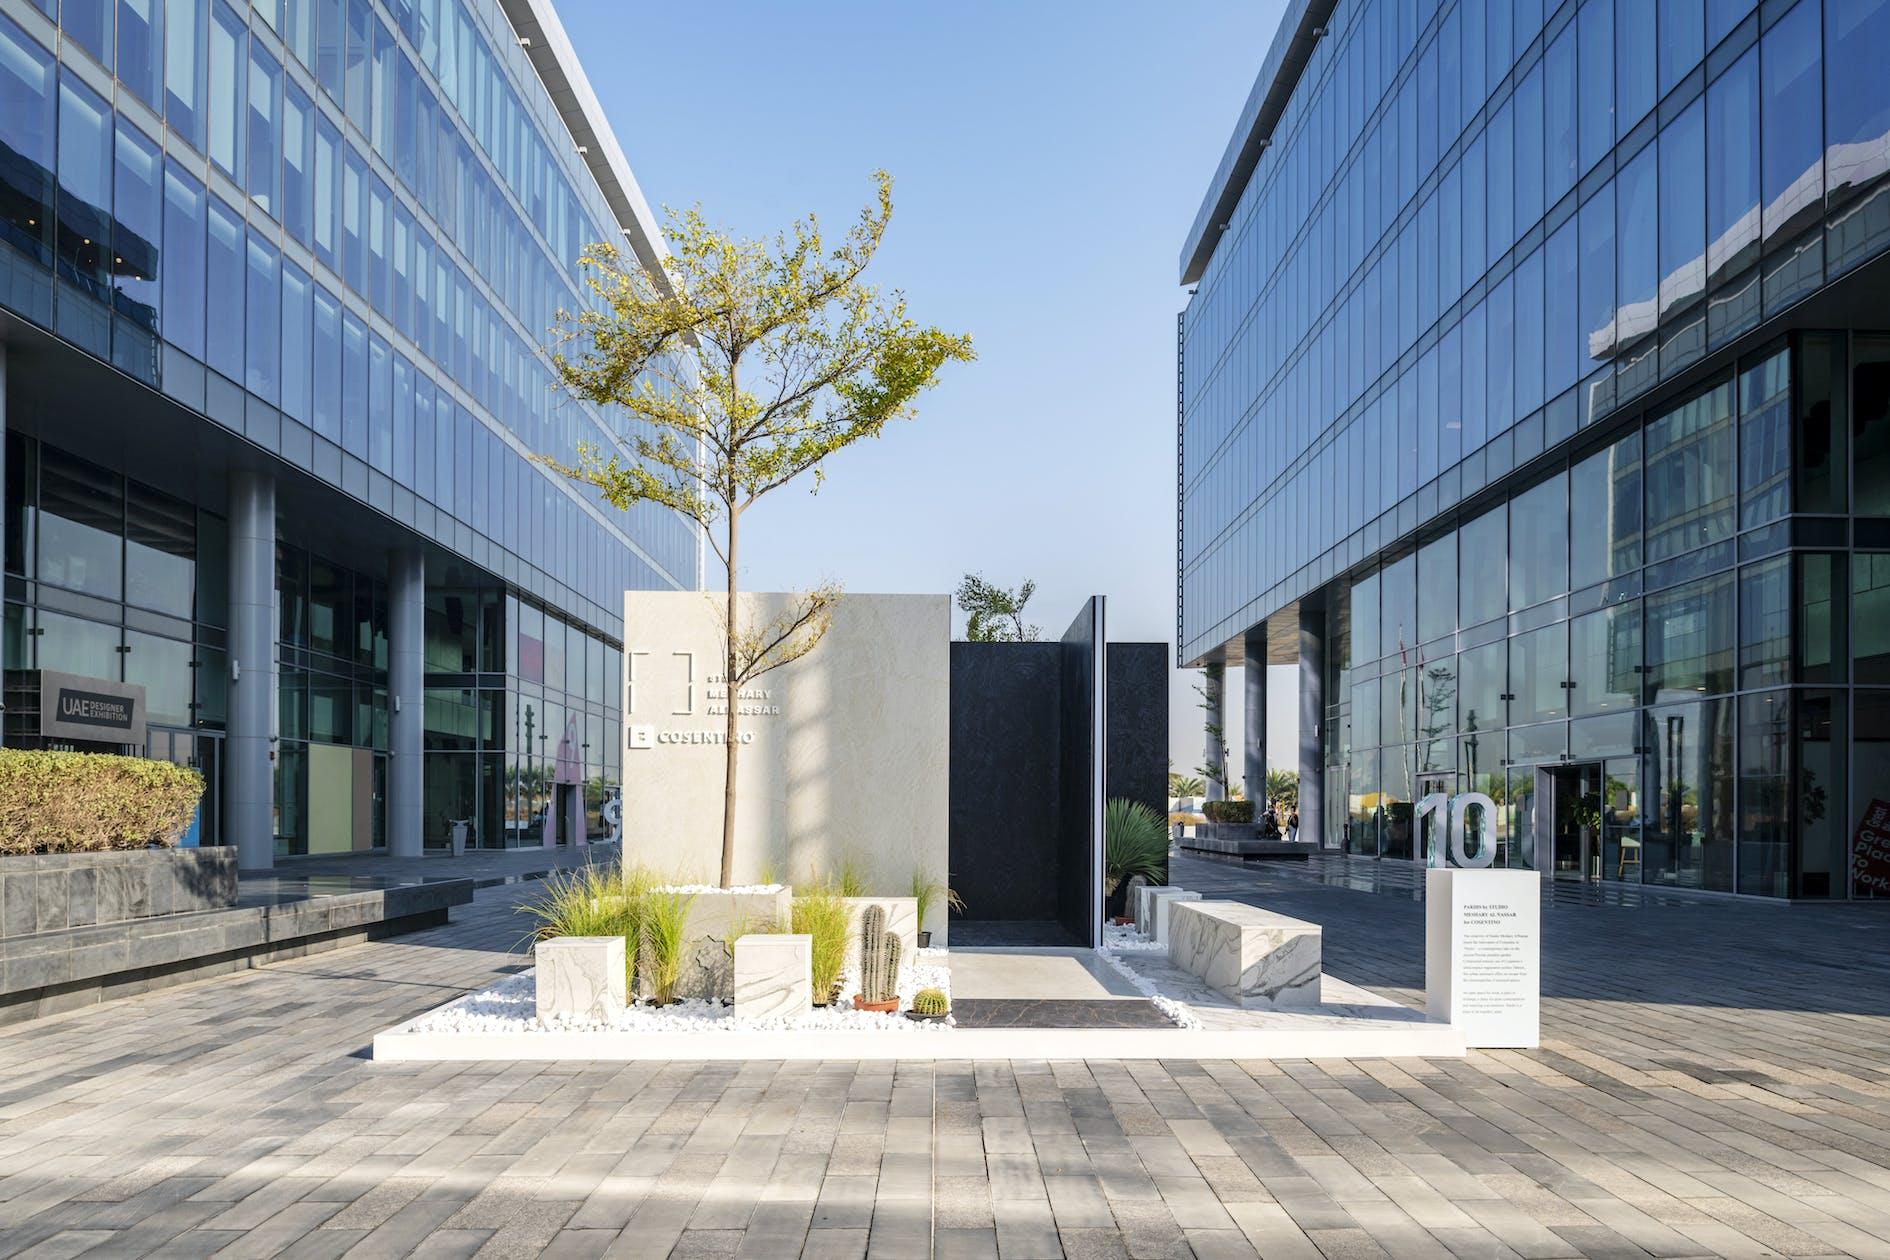 Image of Pardis DektonbyCosentino DDW 2020 1 1 in Cosentino presents 'Pardis' at Dubai Design Week 2020 - Cosentino